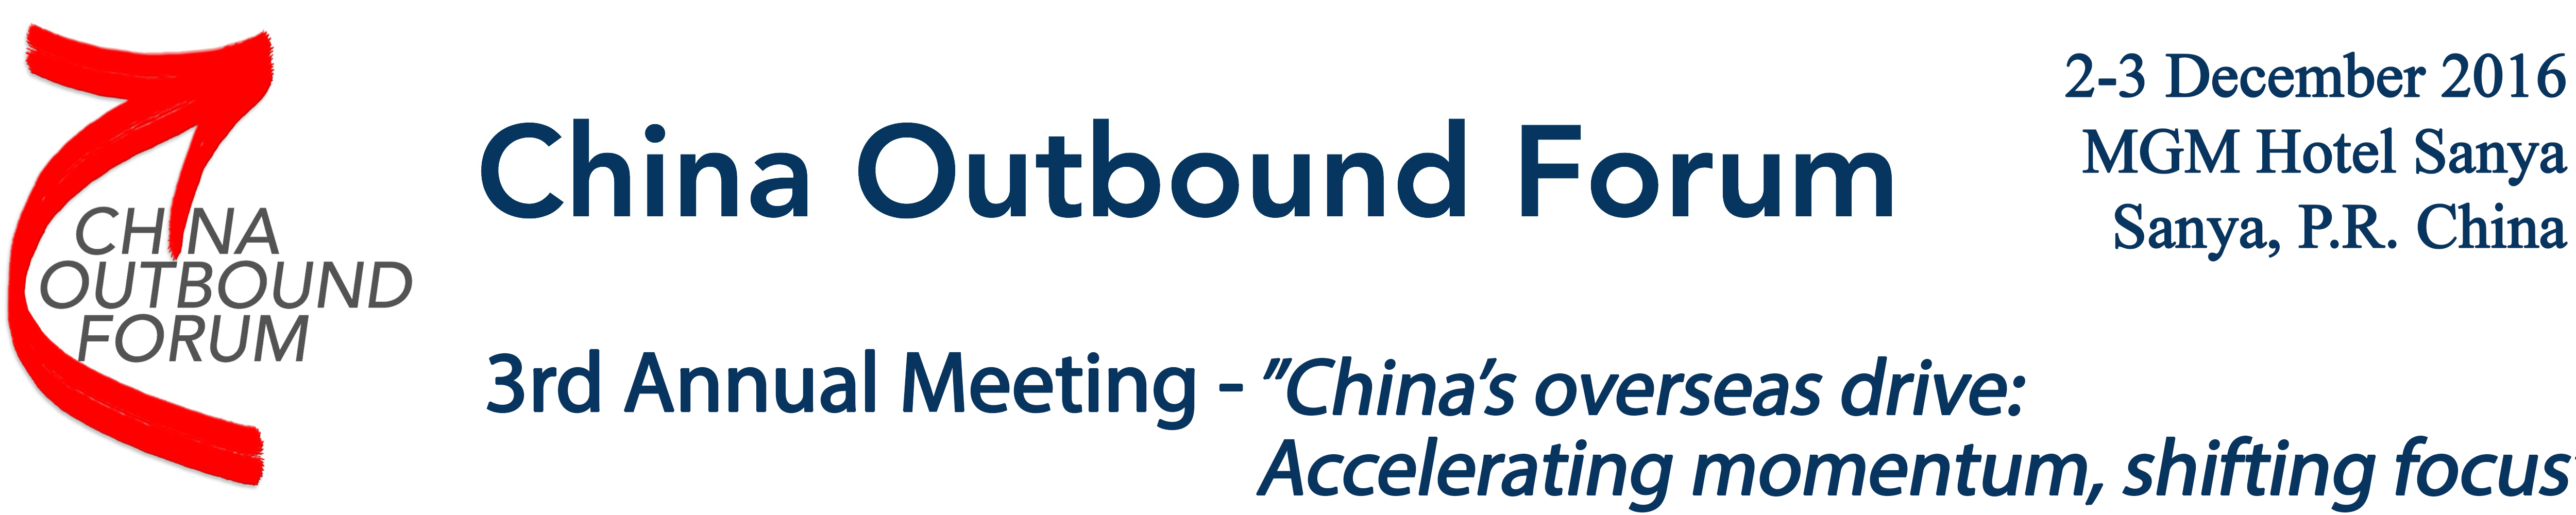 China Outbound Forum